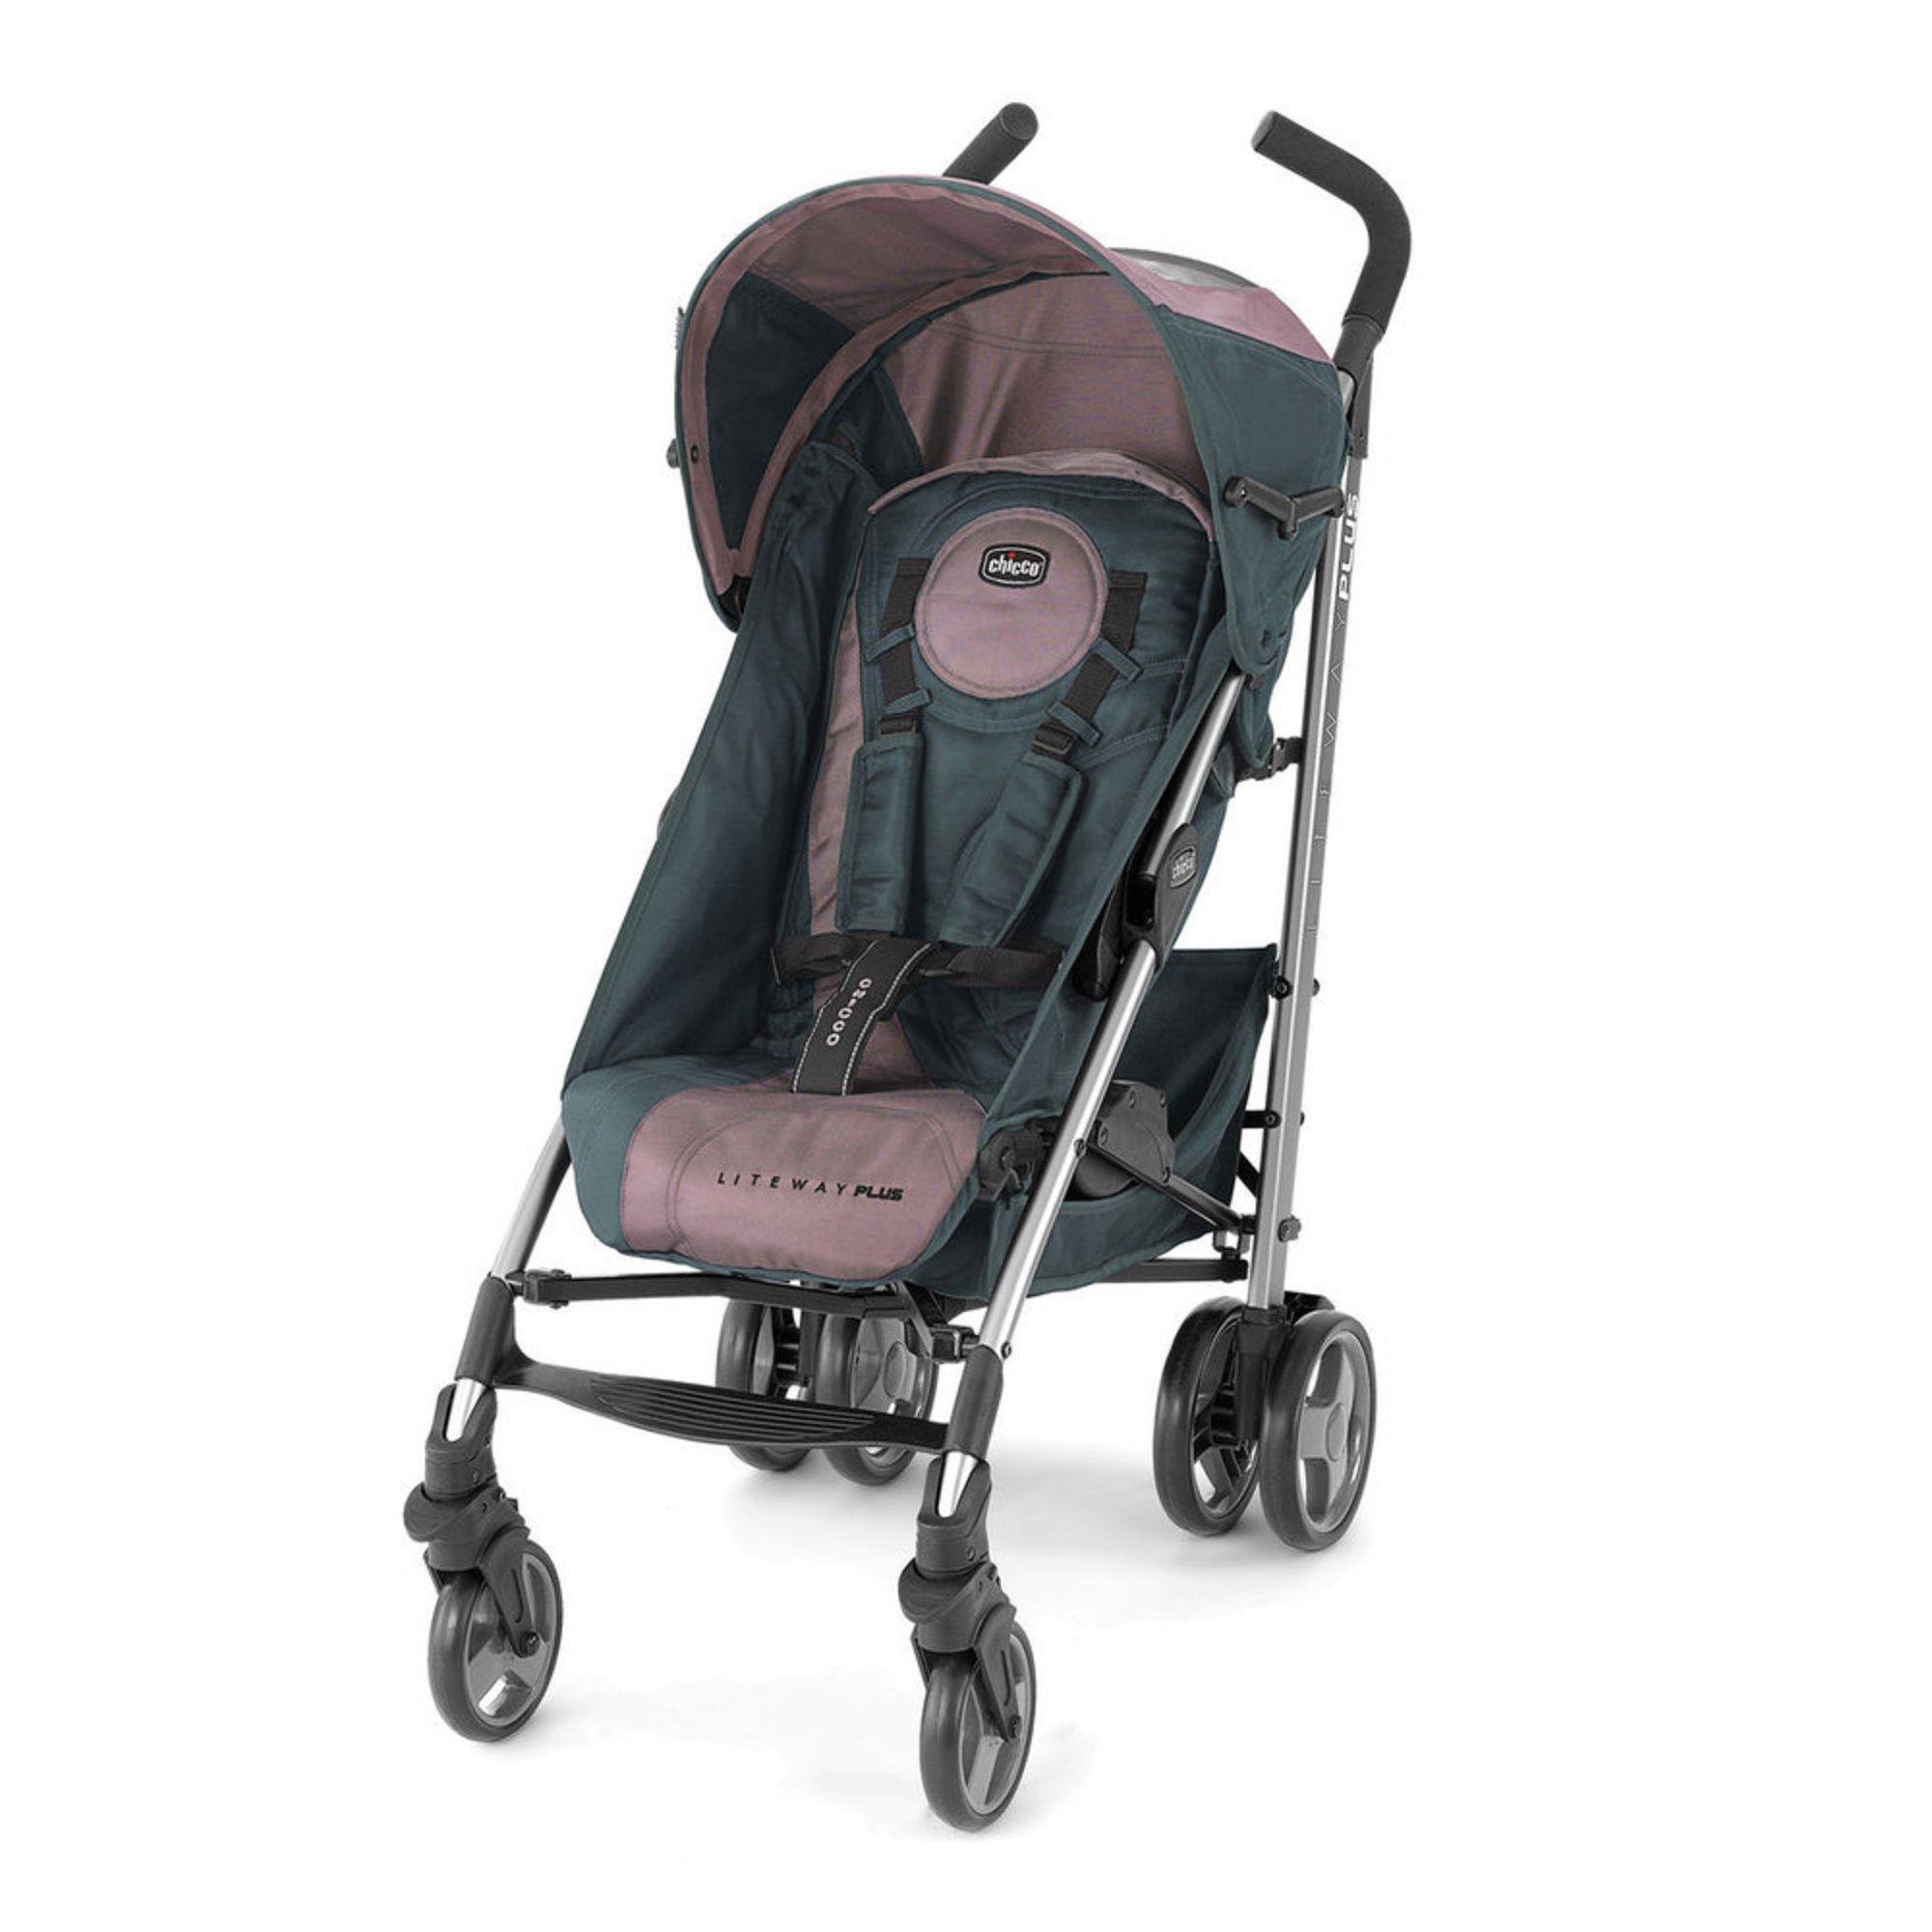 chicco liteway plus stroller lyra lightweight strollers baby kids toys shop your navy. Black Bedroom Furniture Sets. Home Design Ideas